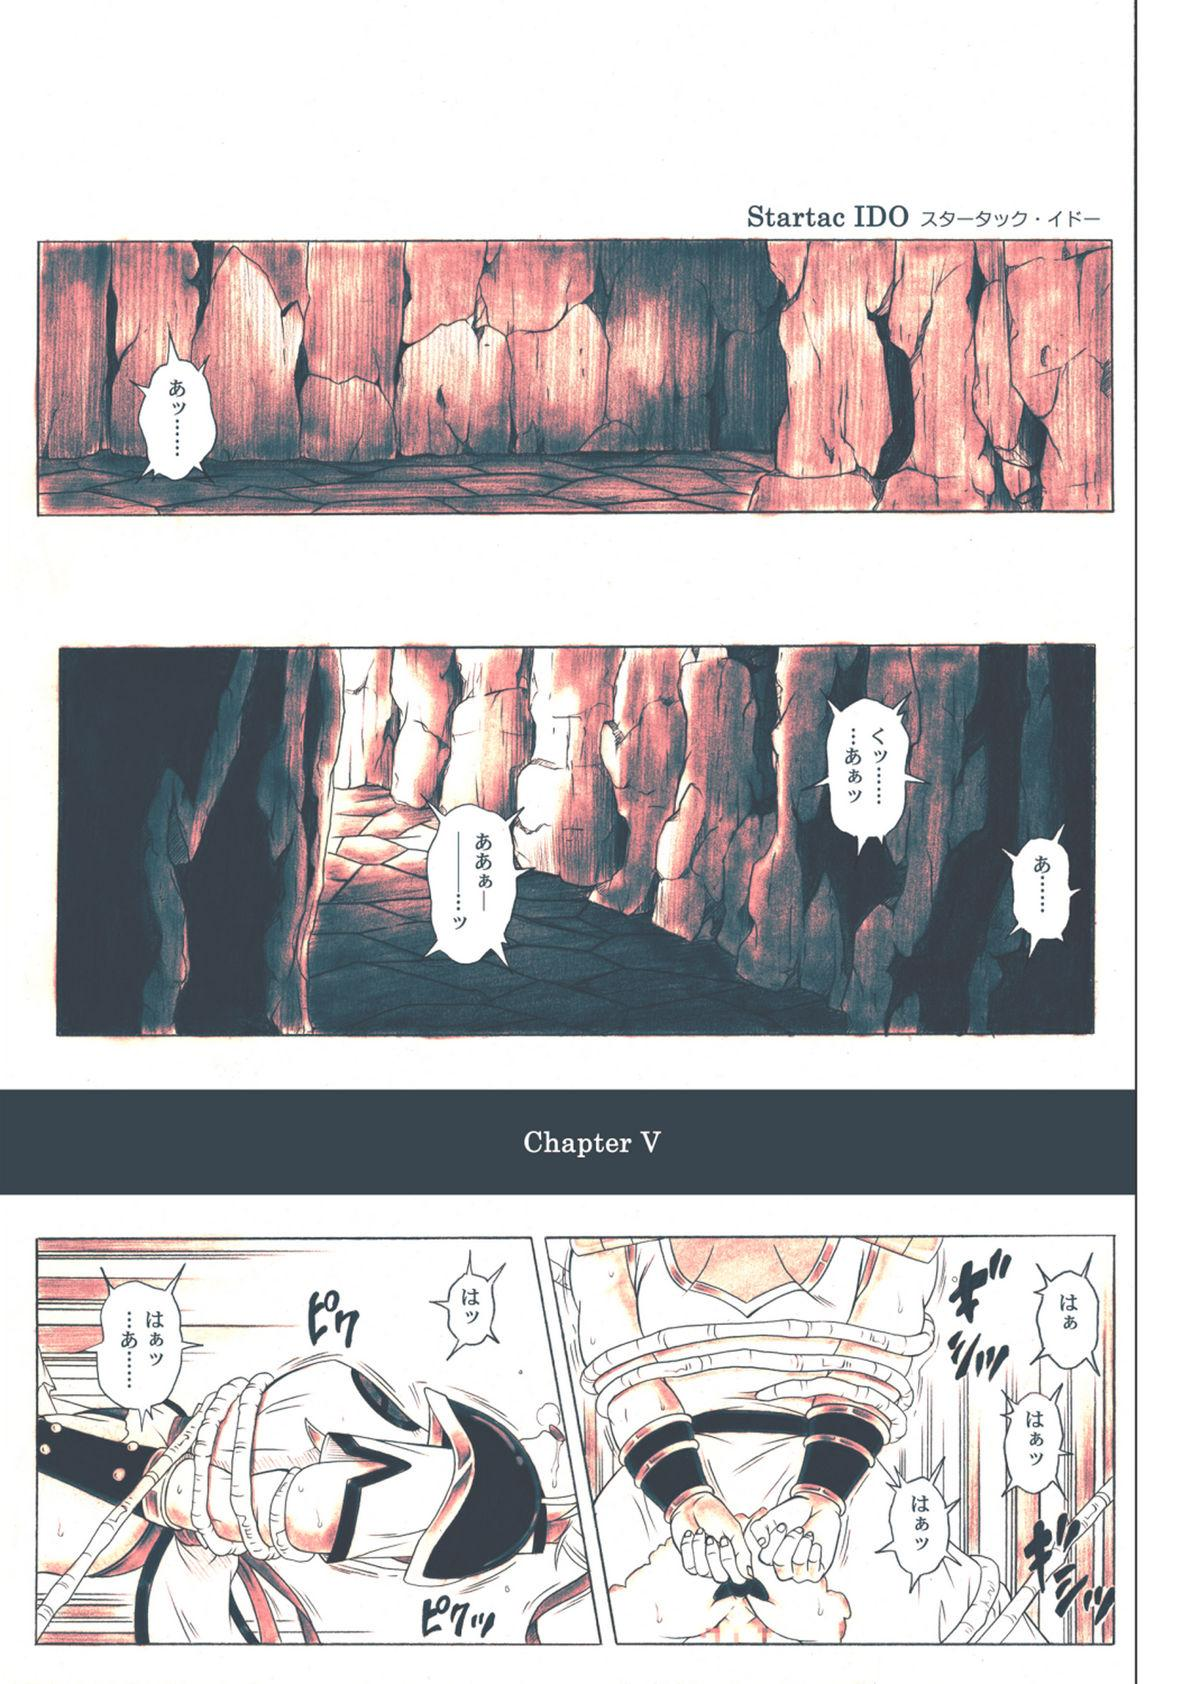 [Cyclone (Reizei, Izumi)] STAR TAC IDO ~Youkuso Haja no Doukutsu he~ Chuuhen Download edition (Dragon Warrior: Dai's Great Adventure) [Digital] 110